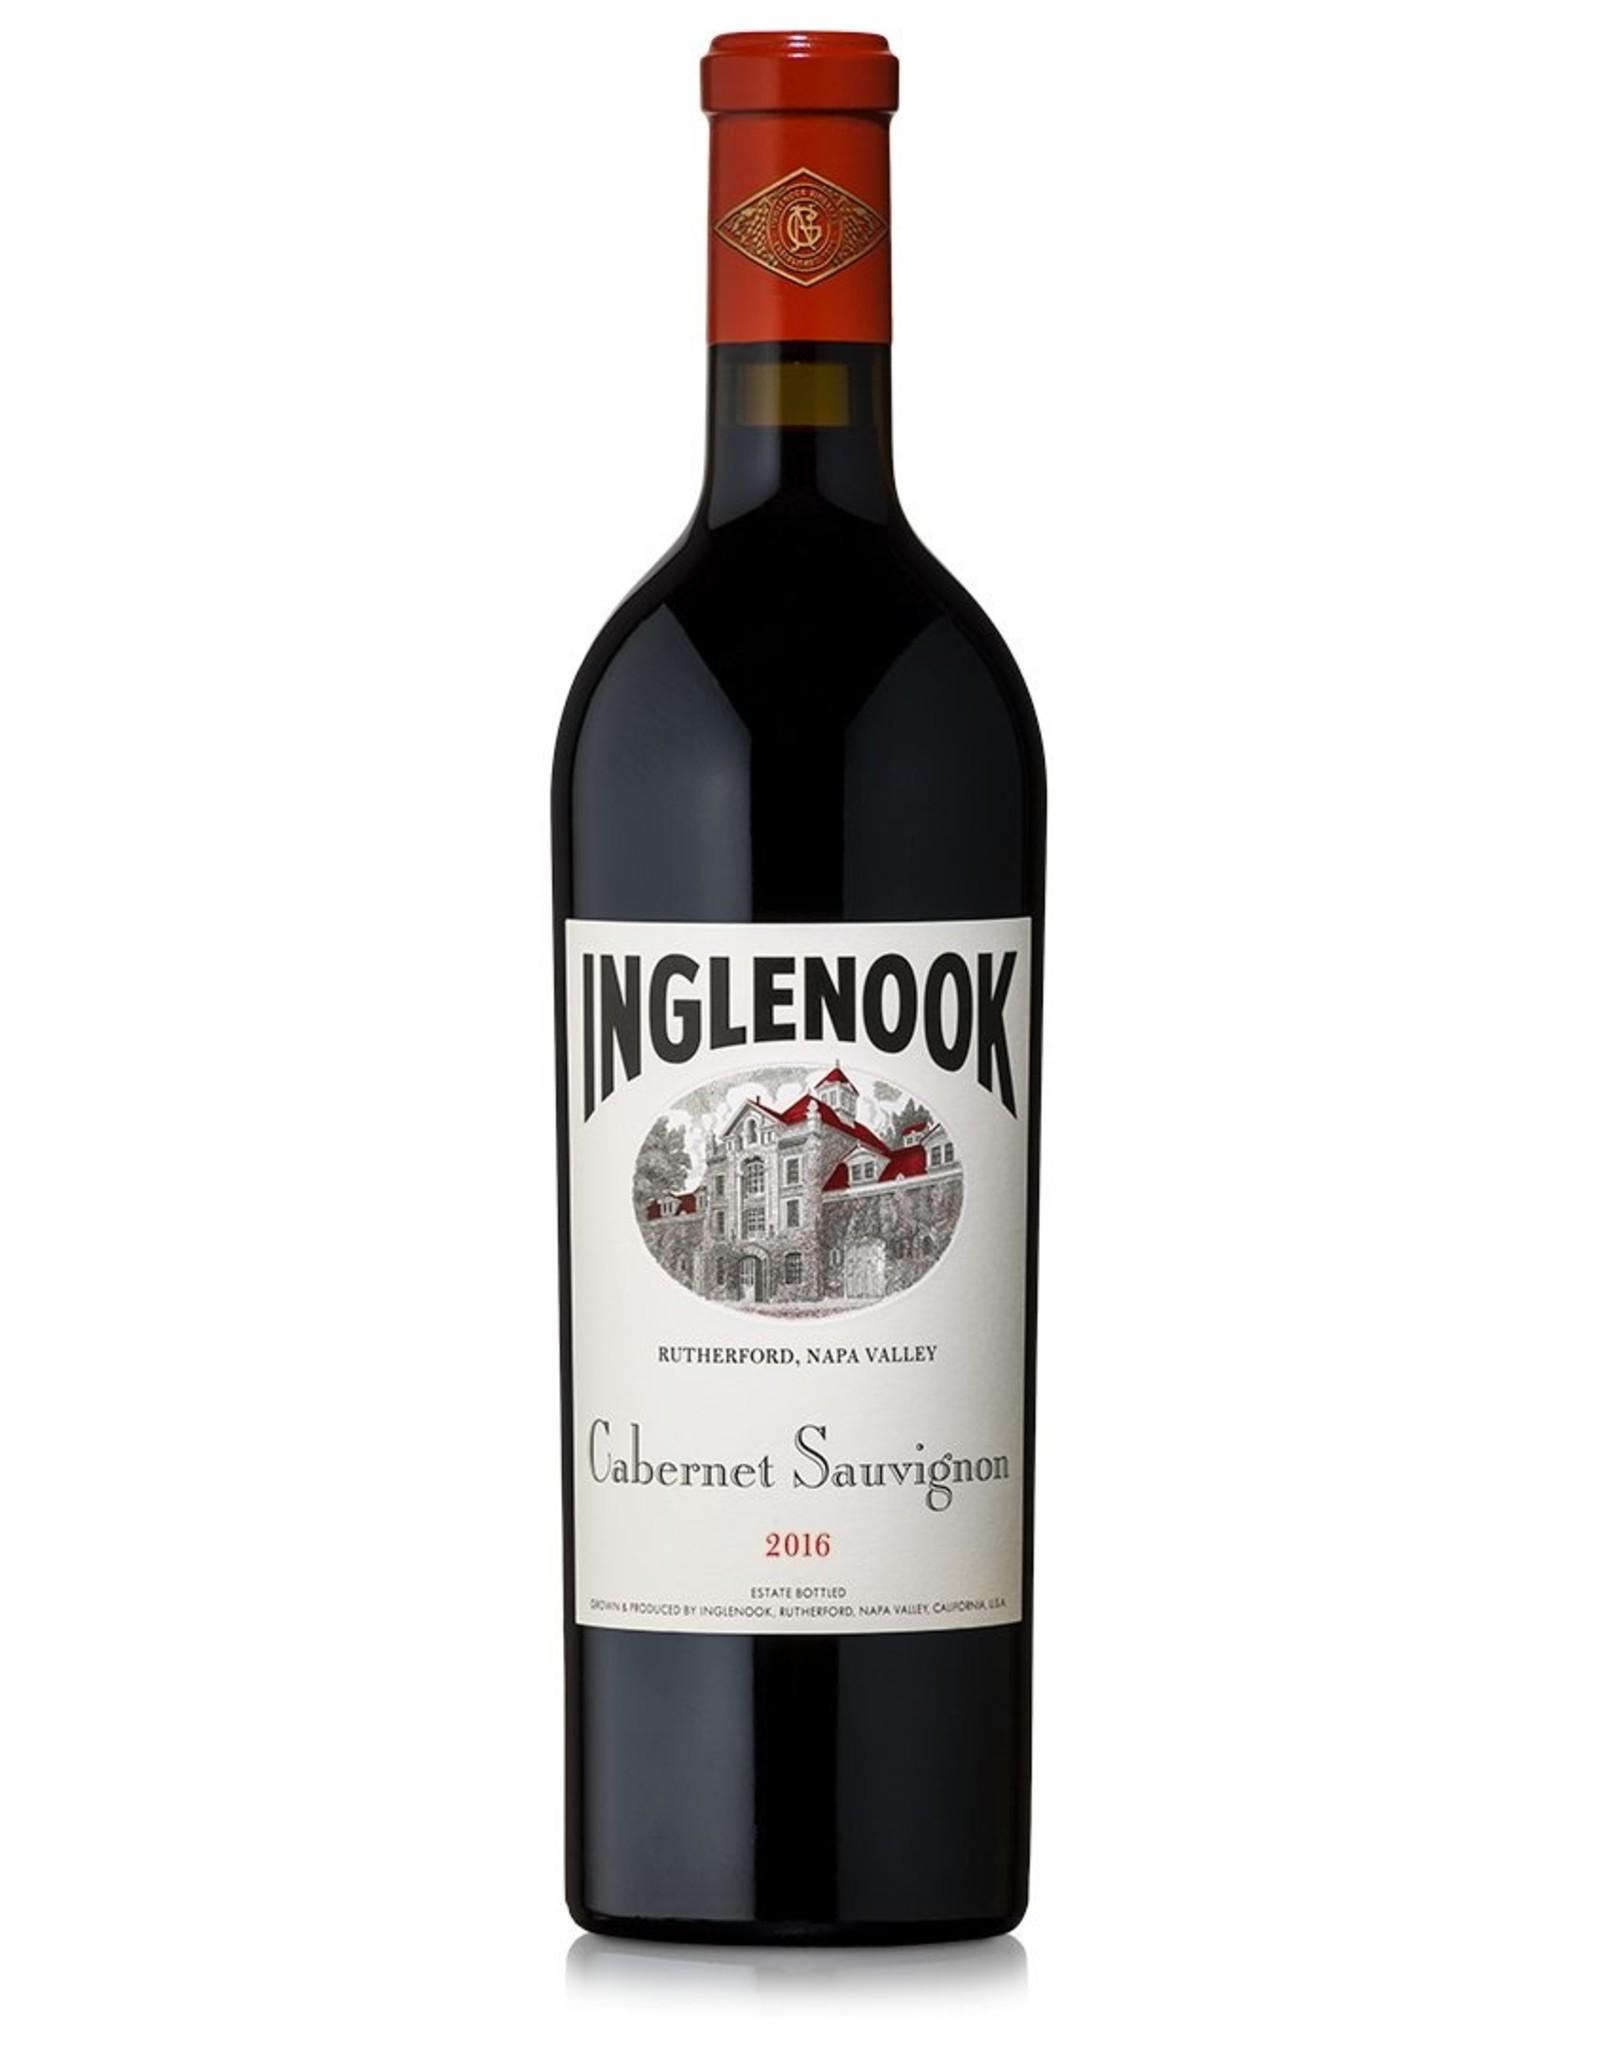 Red Wine 2016, Inglenook, Cabernet Sauvignon, Rutherford, Napa Valley, California, 14.2% Alc, CTnr